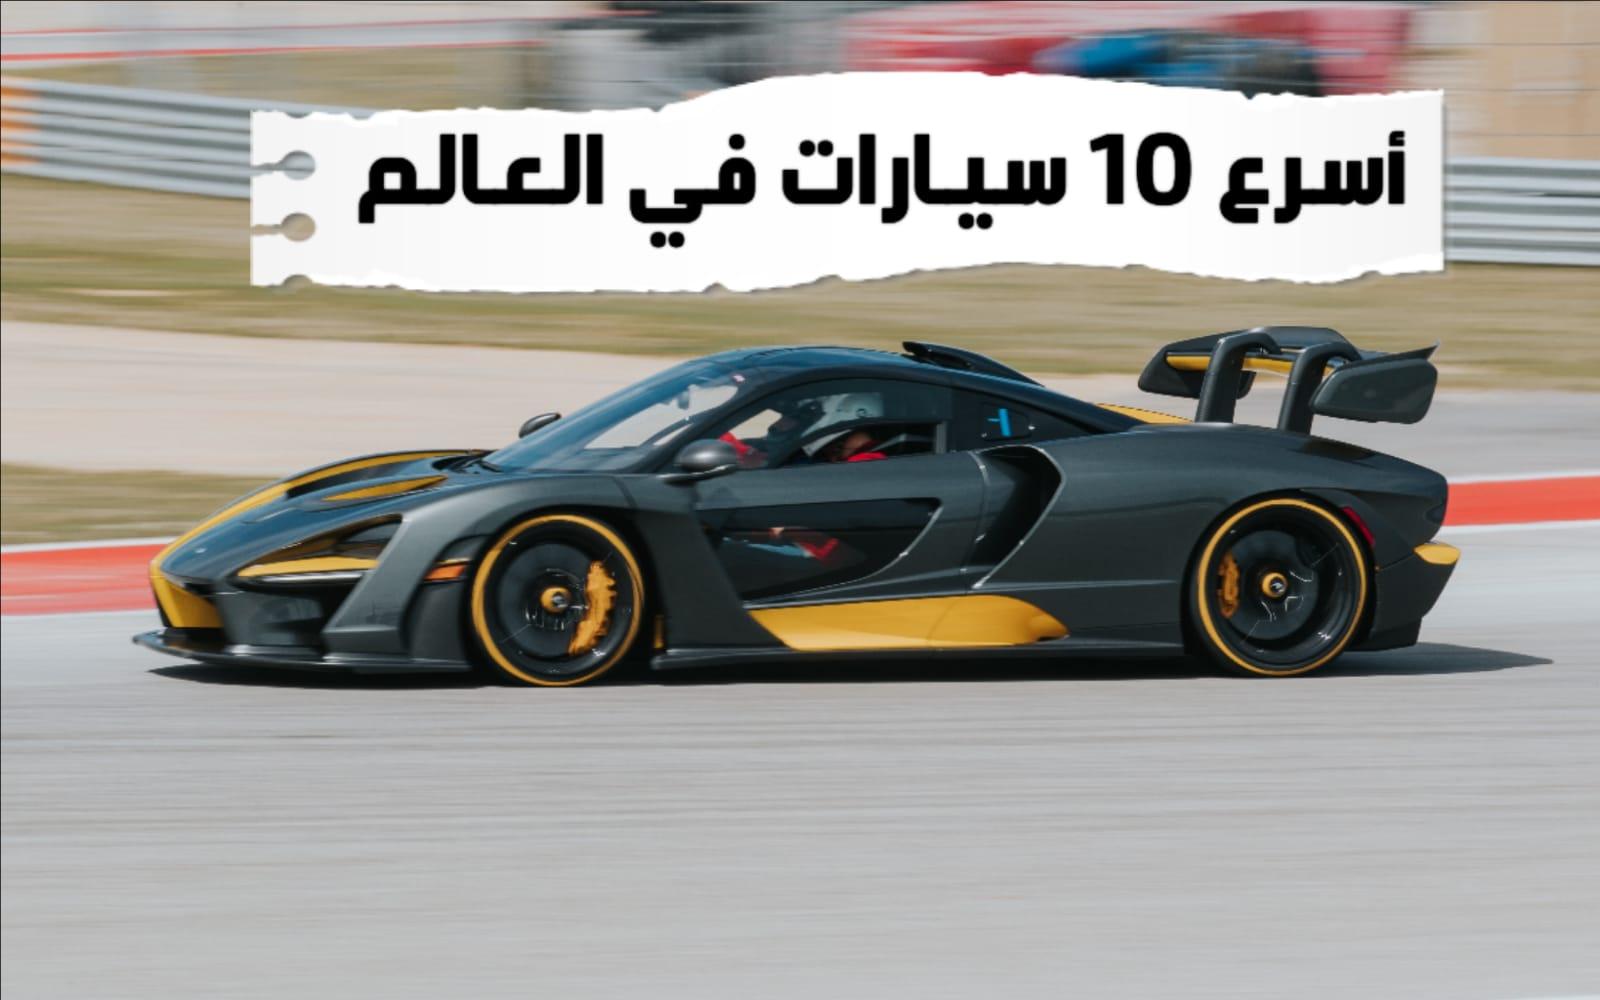 WhatsApp Image 2020 06 13 at 1.41.21 AM - سيارات سريعه أسرع 10 سيارات في العالم